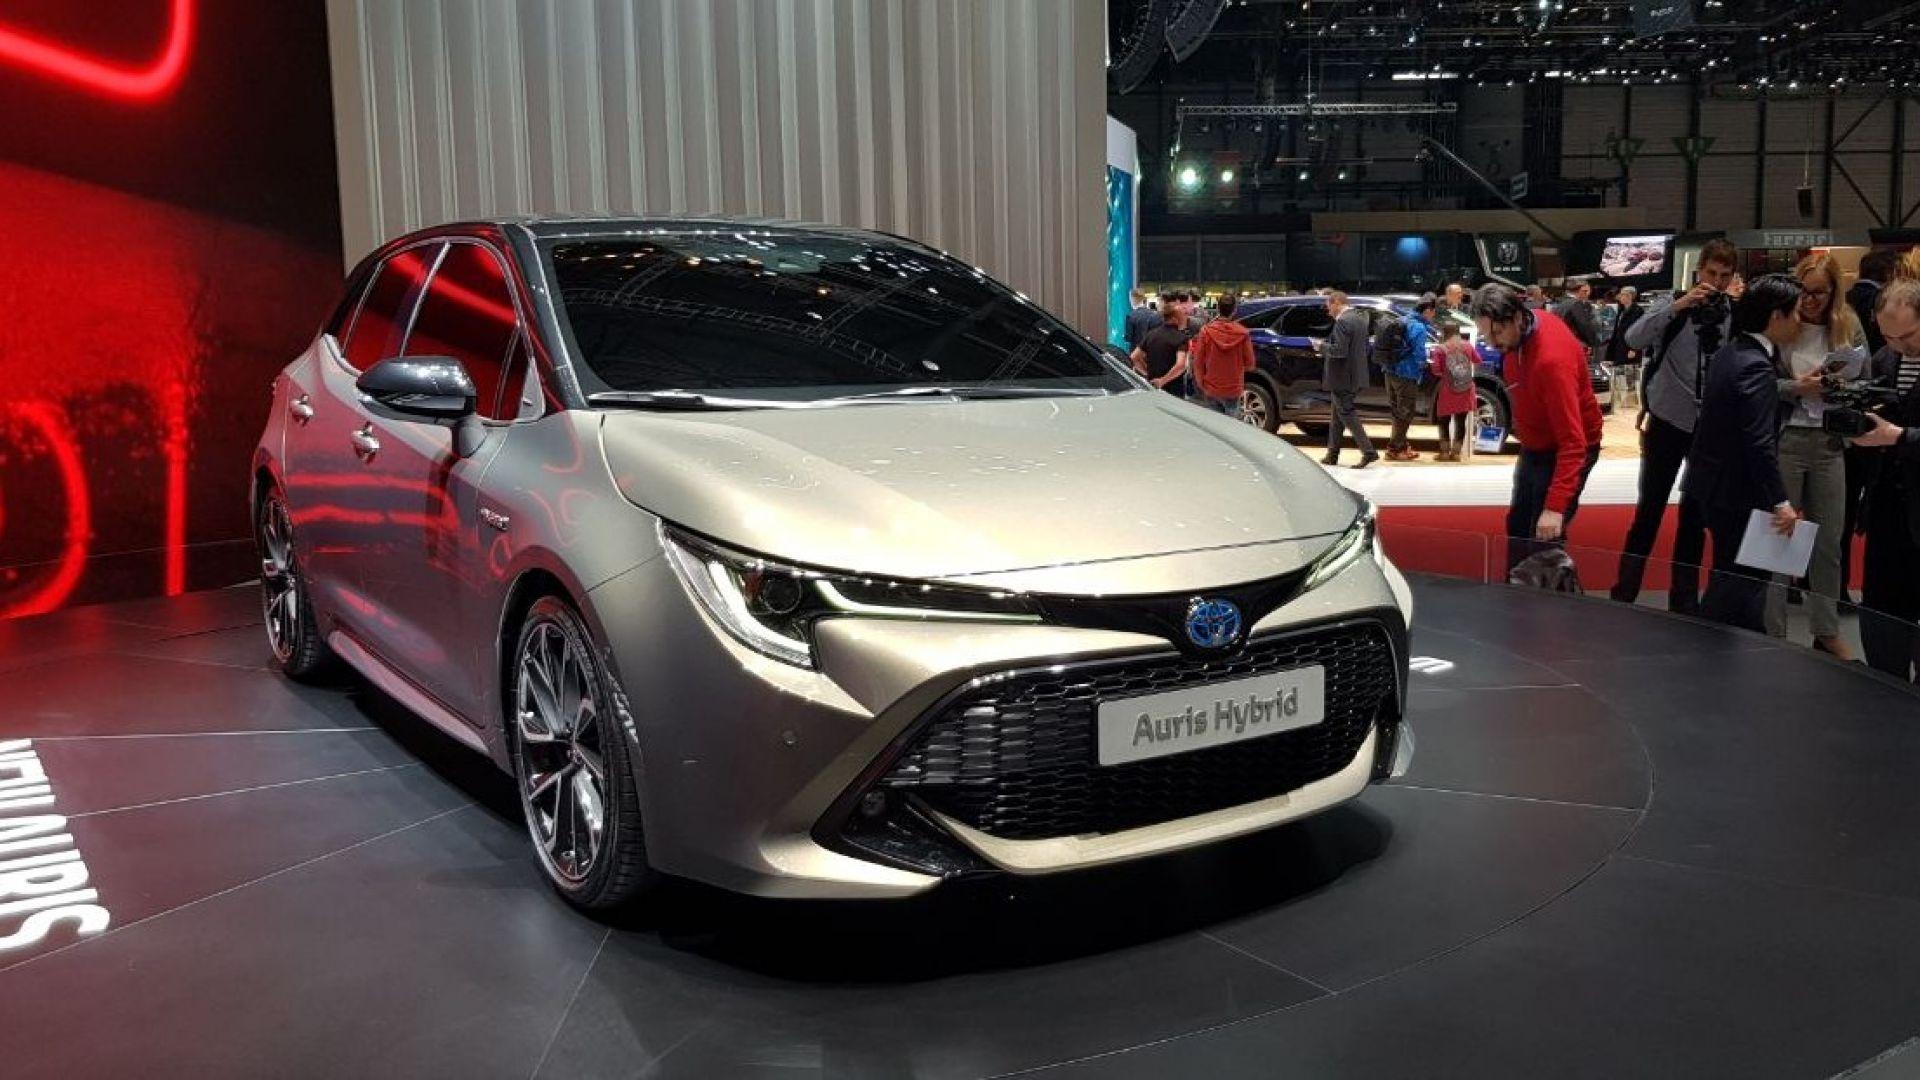 2018 Toyota Supra >> Salone di Ginevra 2018: le novità Toyota. Nuova Auris ...